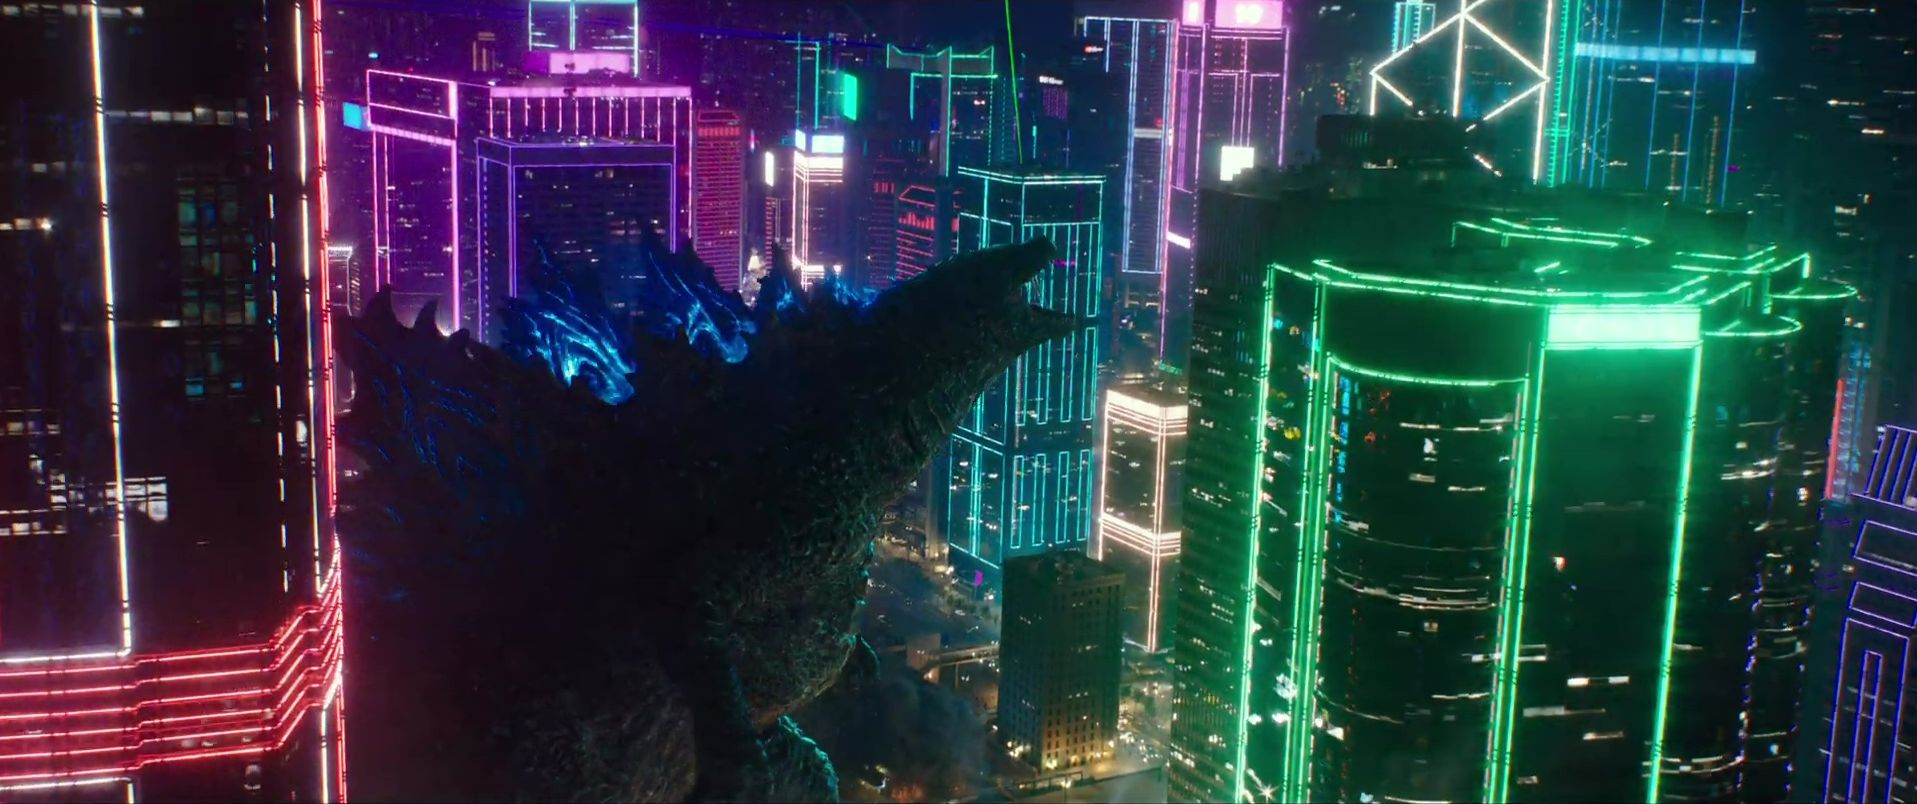 Godzilla kontra Kong - analiza zwiastuna. Co nam mówi o fabule?